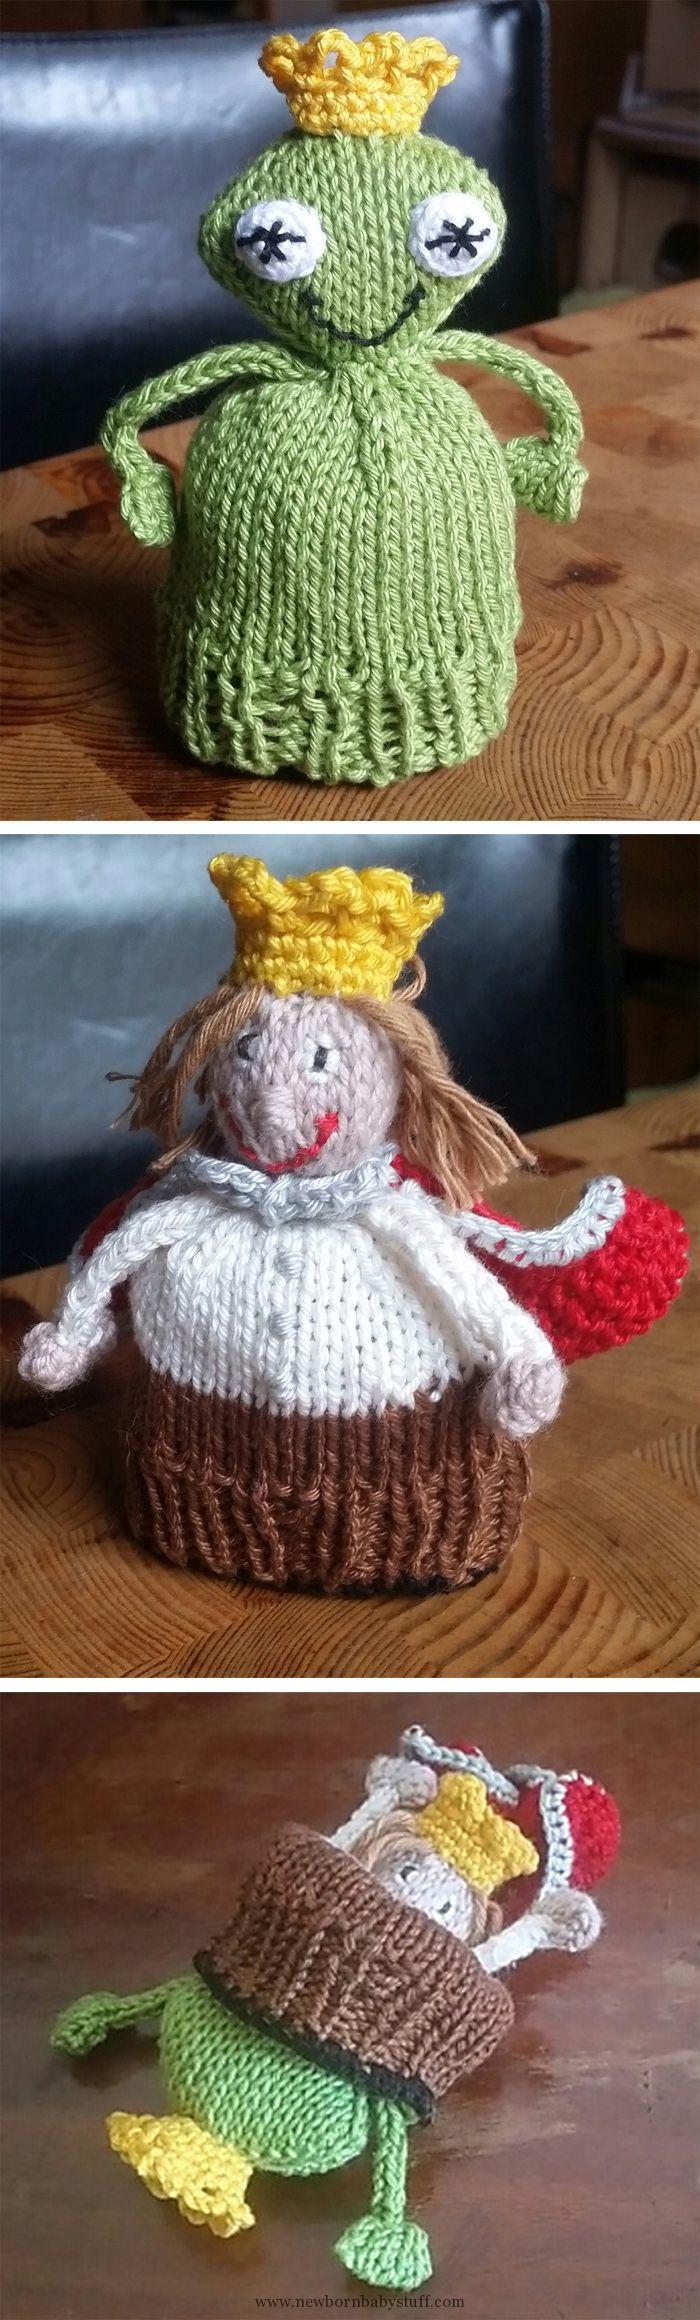 Baby Knitting Patterns Free Knitting Pattern for Frog Prince Flip ...